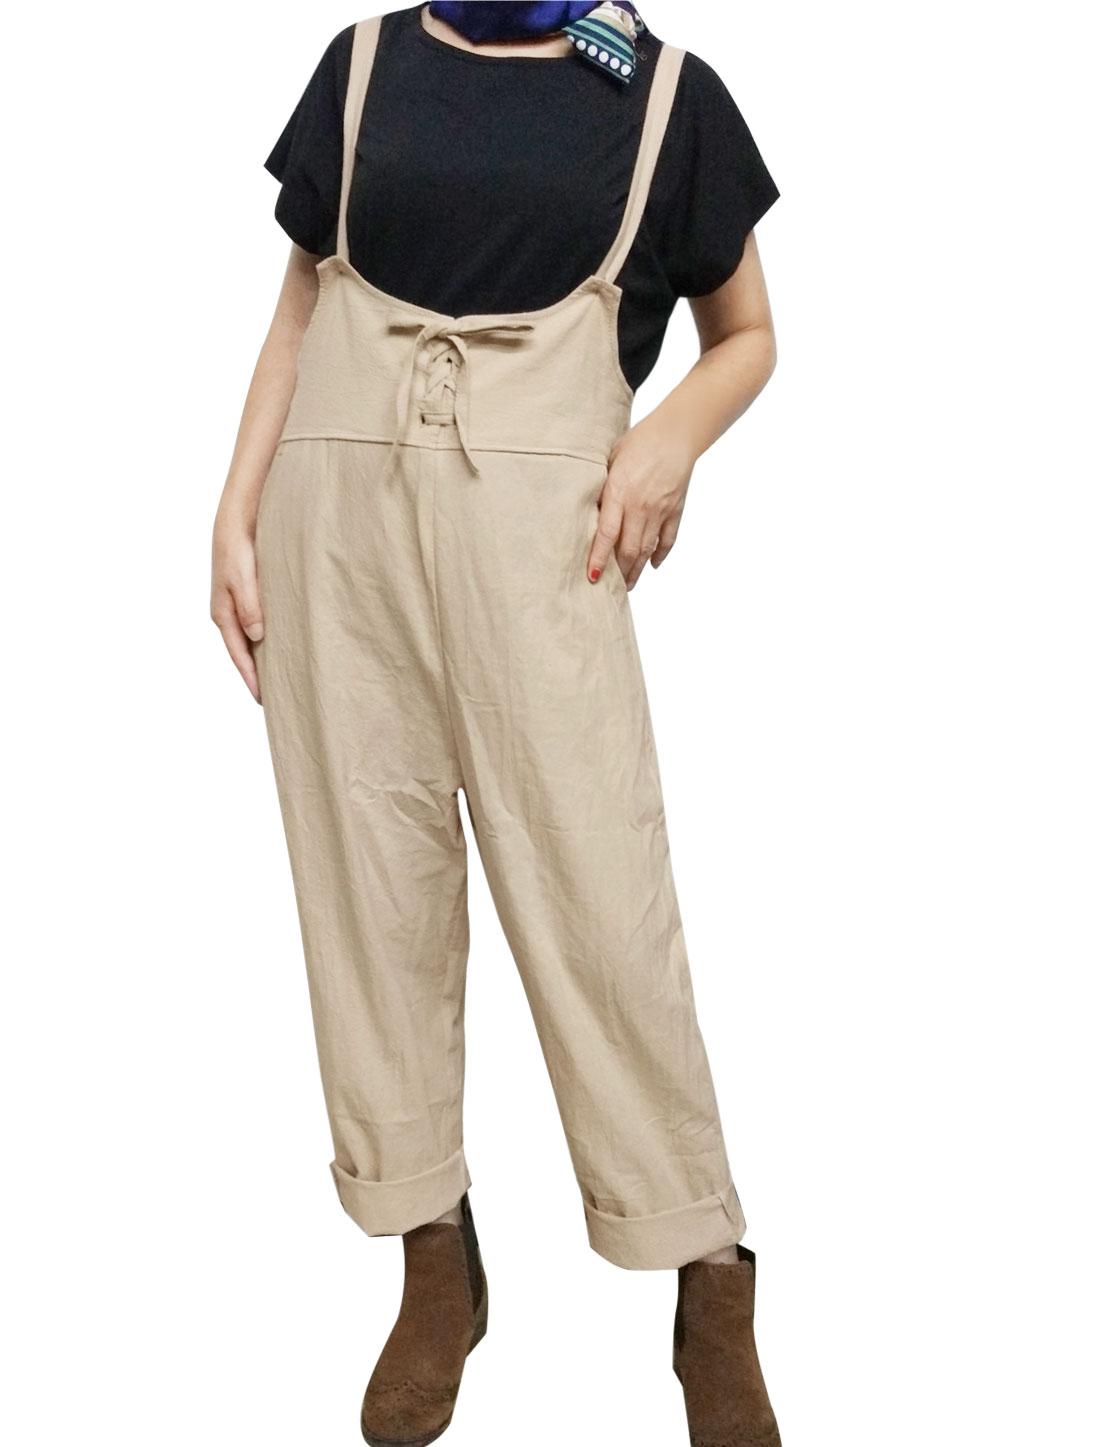 Women Lace Up Front Loose Pockets Suspender Pants Beige M